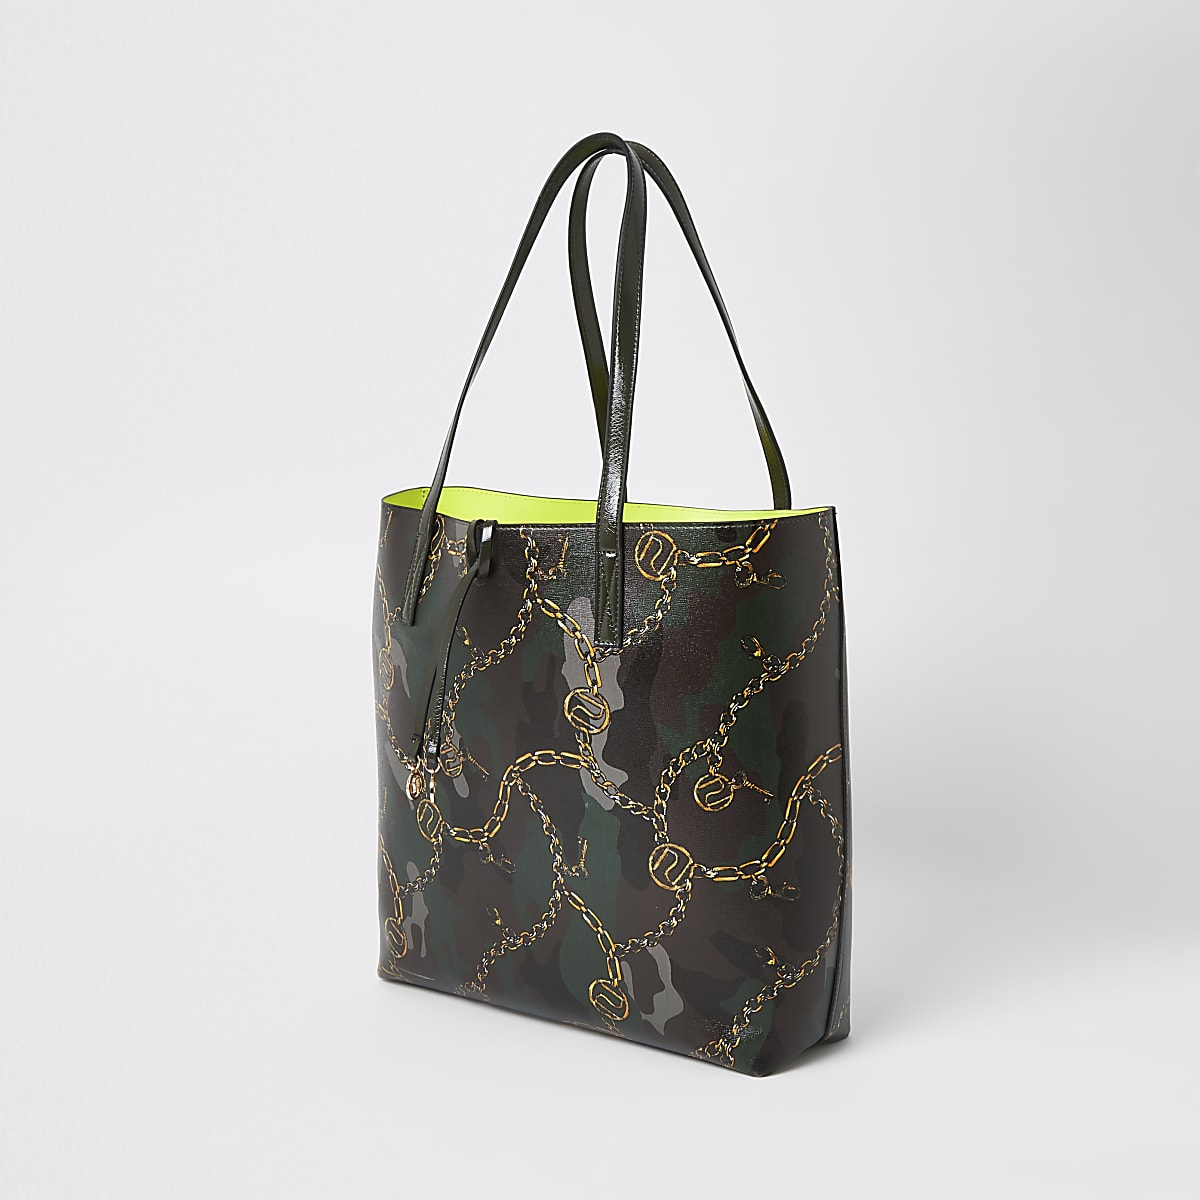 538b52192058 Khaki camo shopper tote bag